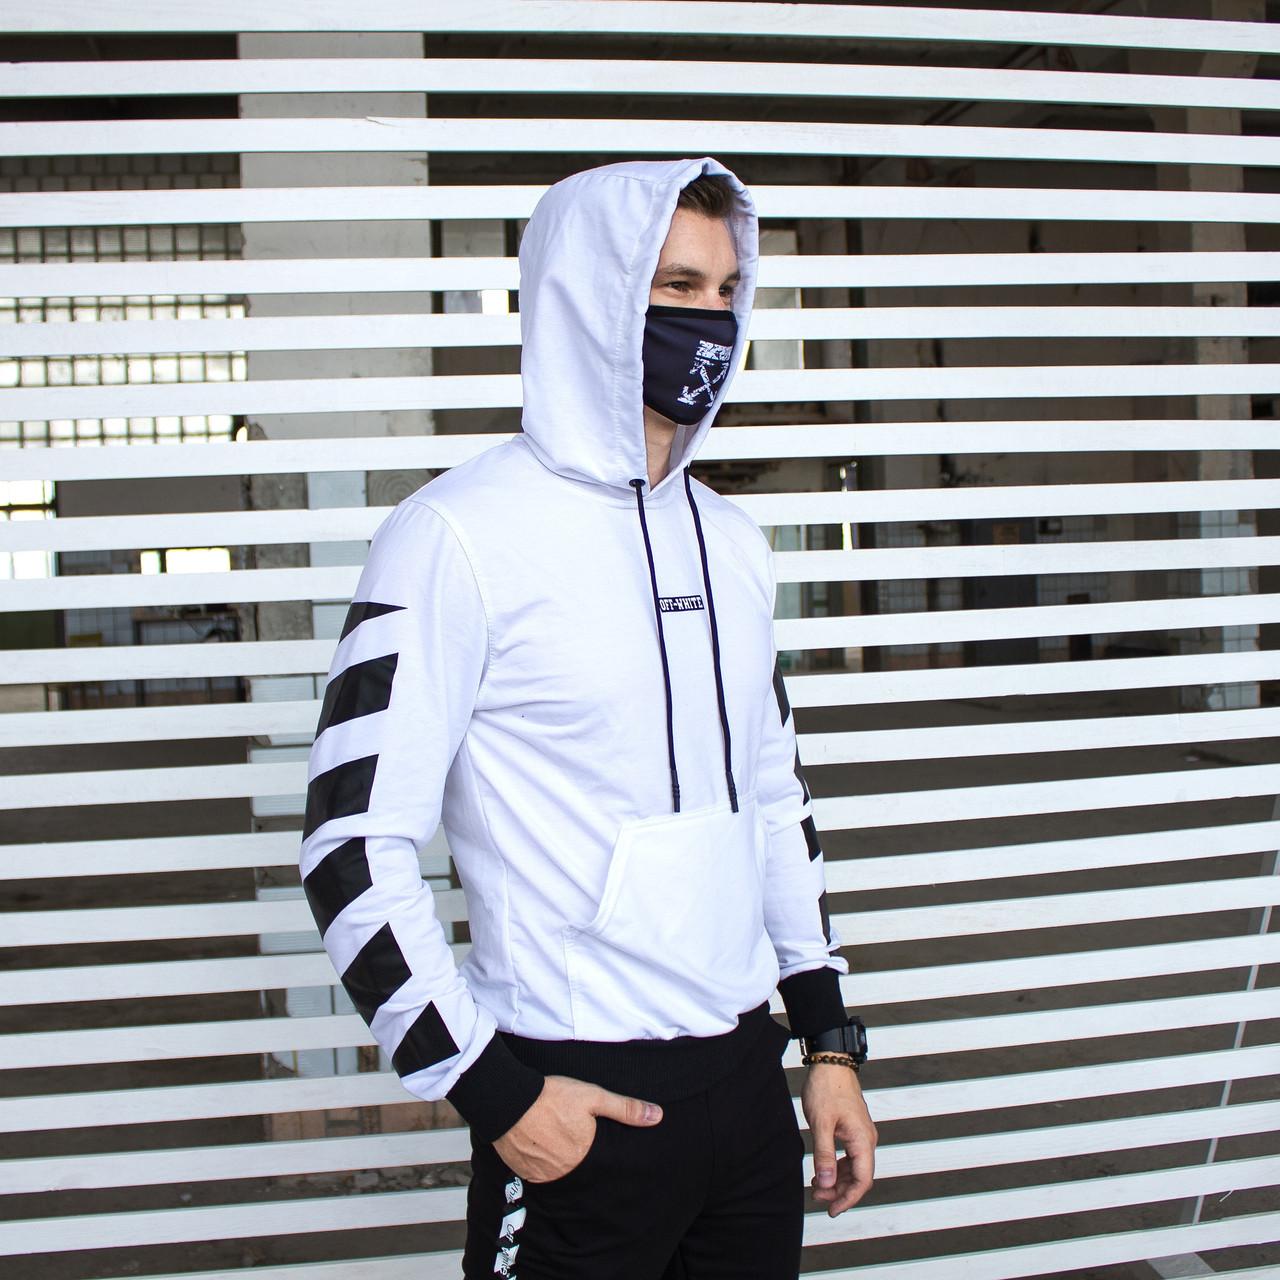 Мужской спортивный костюм Off White (демисезонный спорт. костюм)